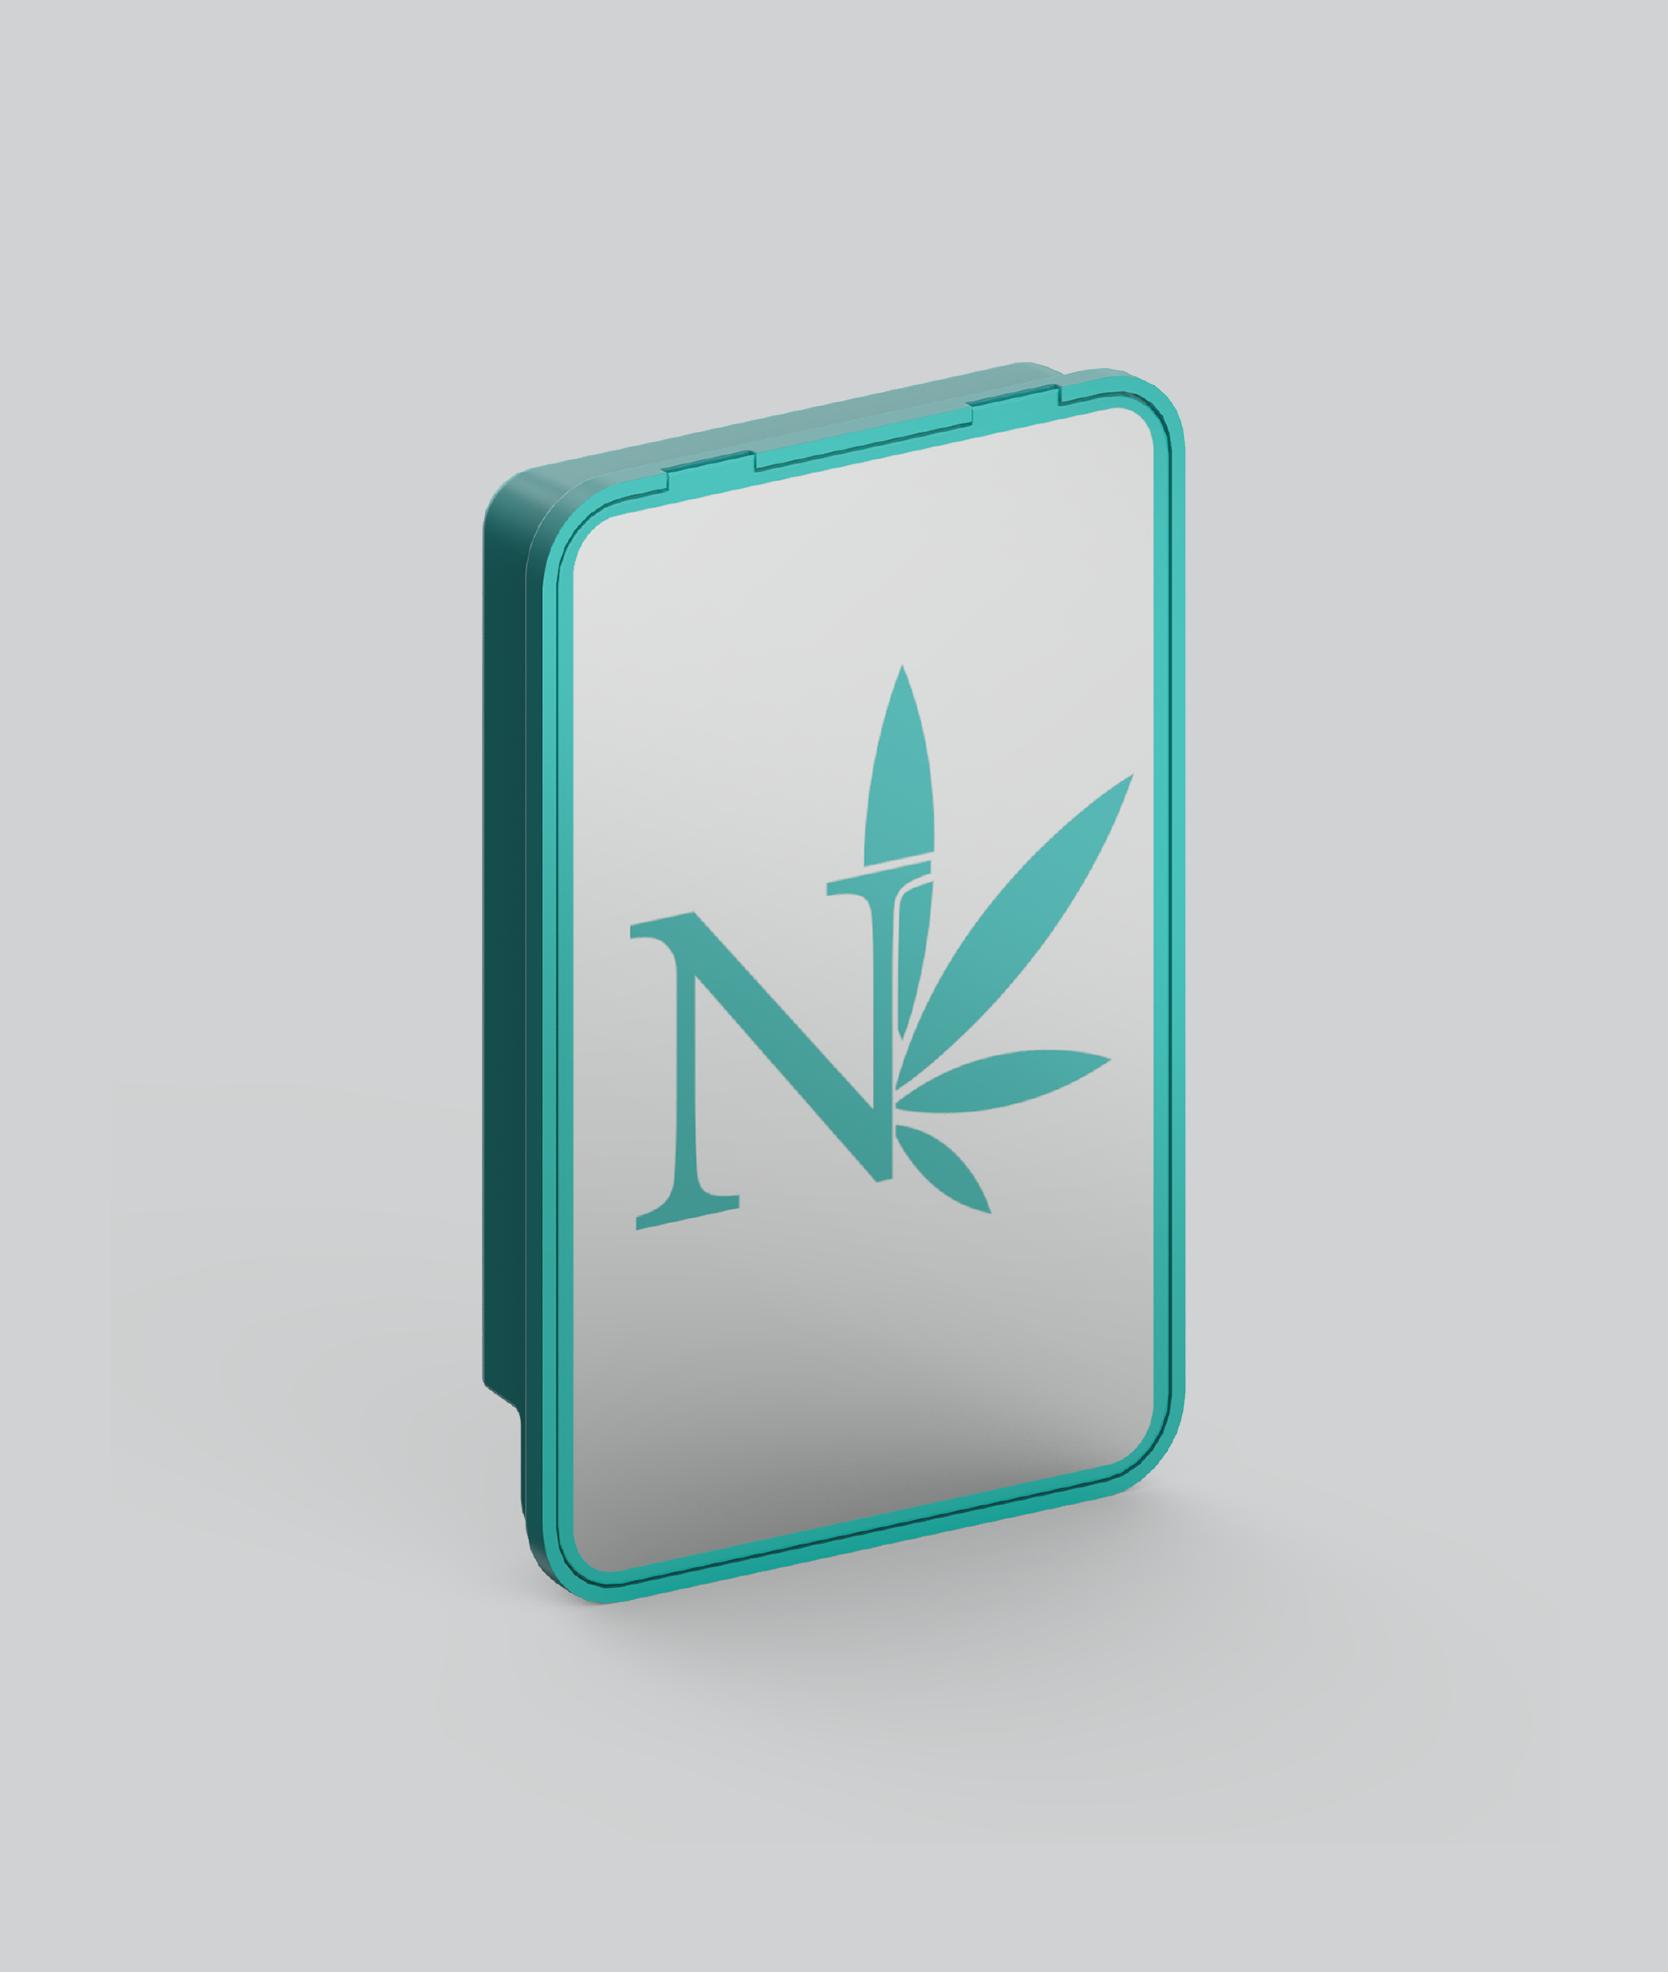 nleaf-snaptech-case-medical-marijuana-packaging